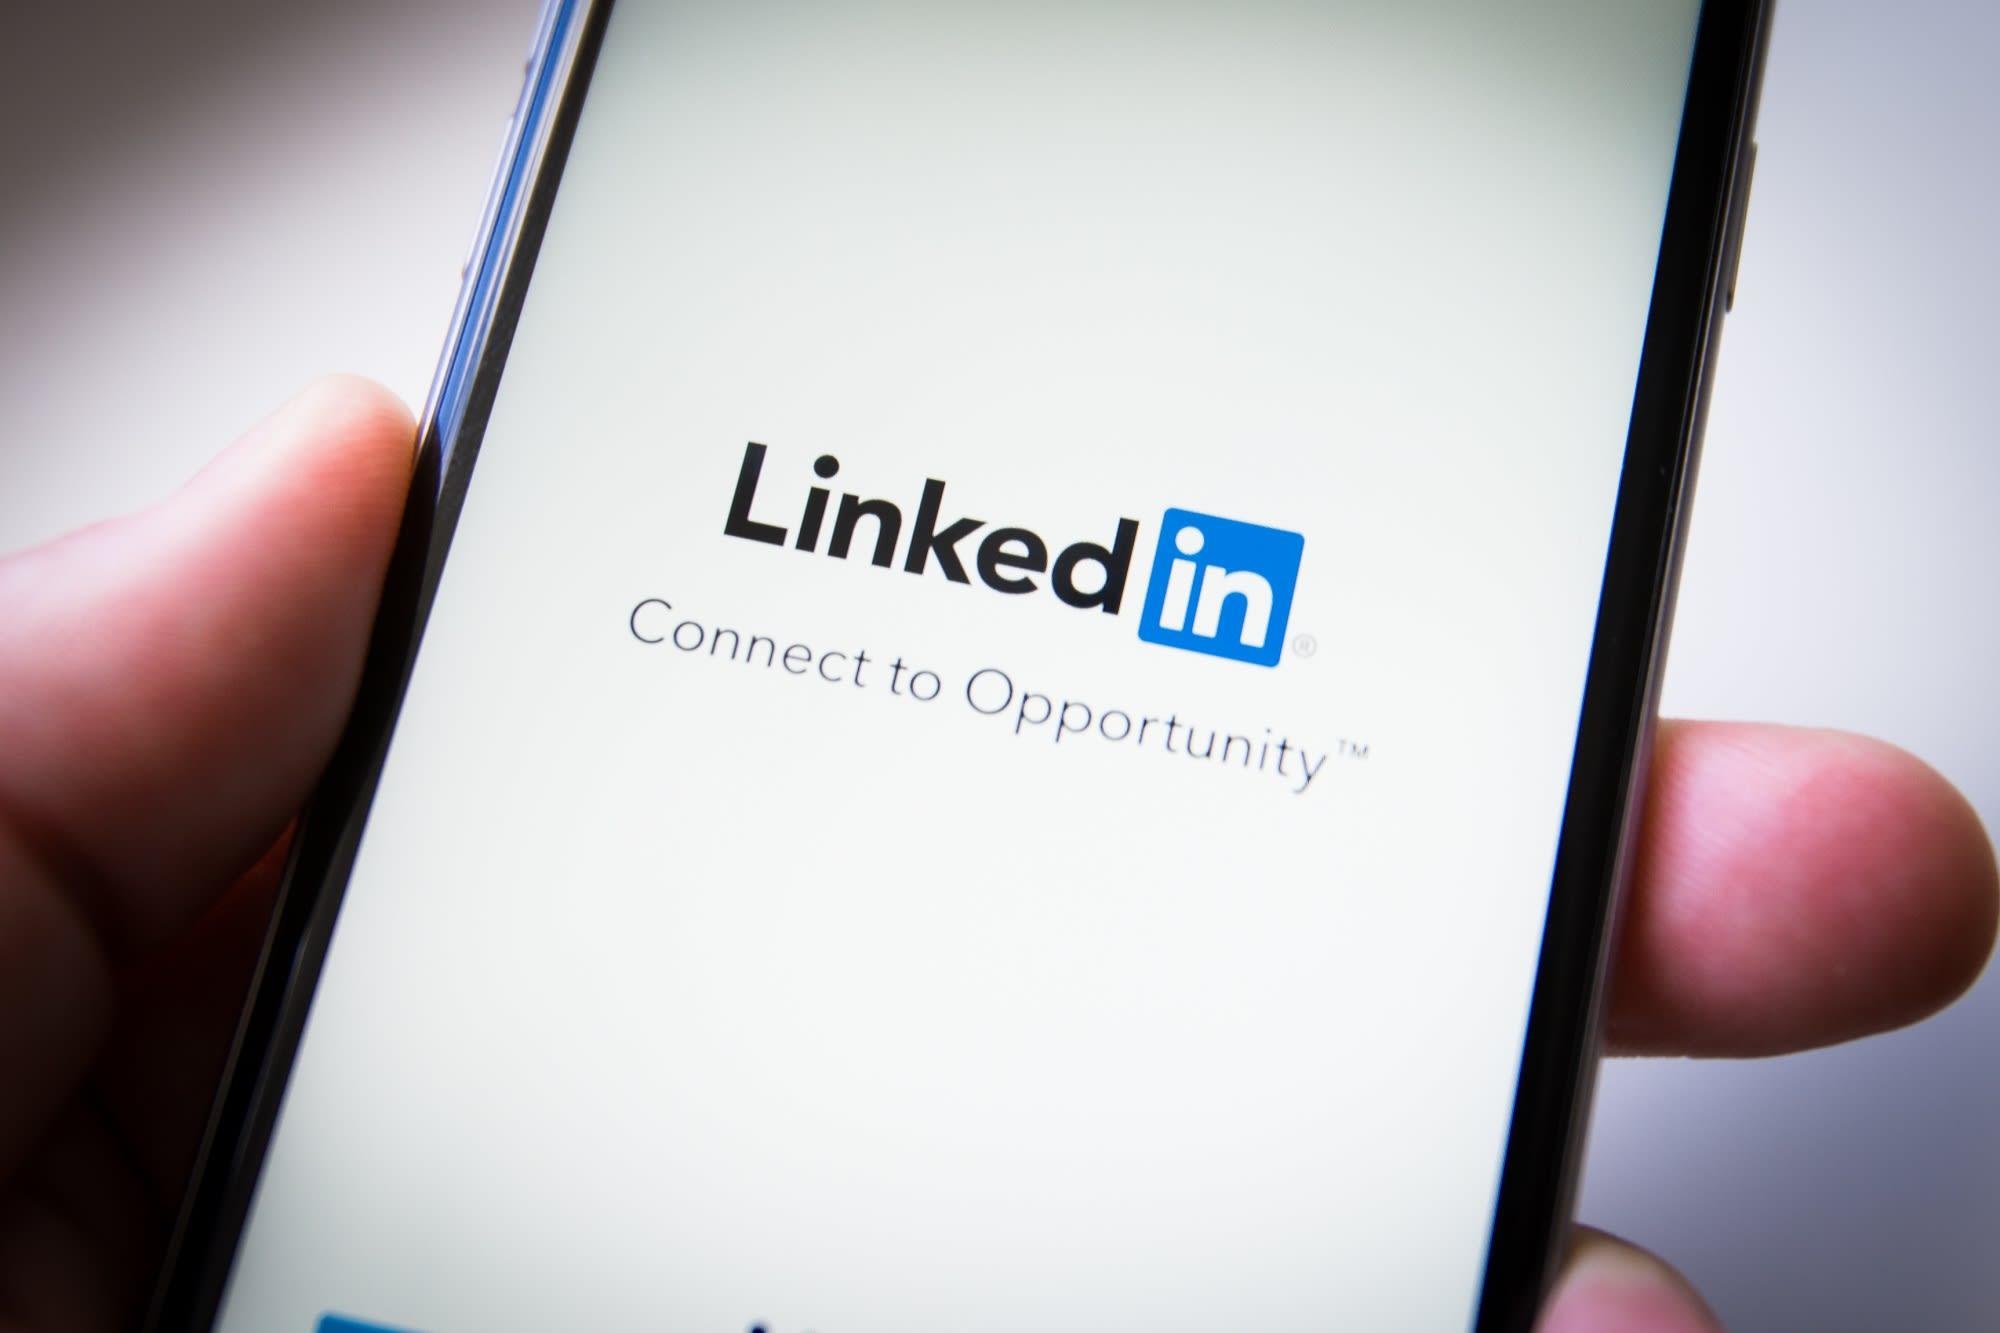 Linkedin now has half a billion members stopboris Image collections